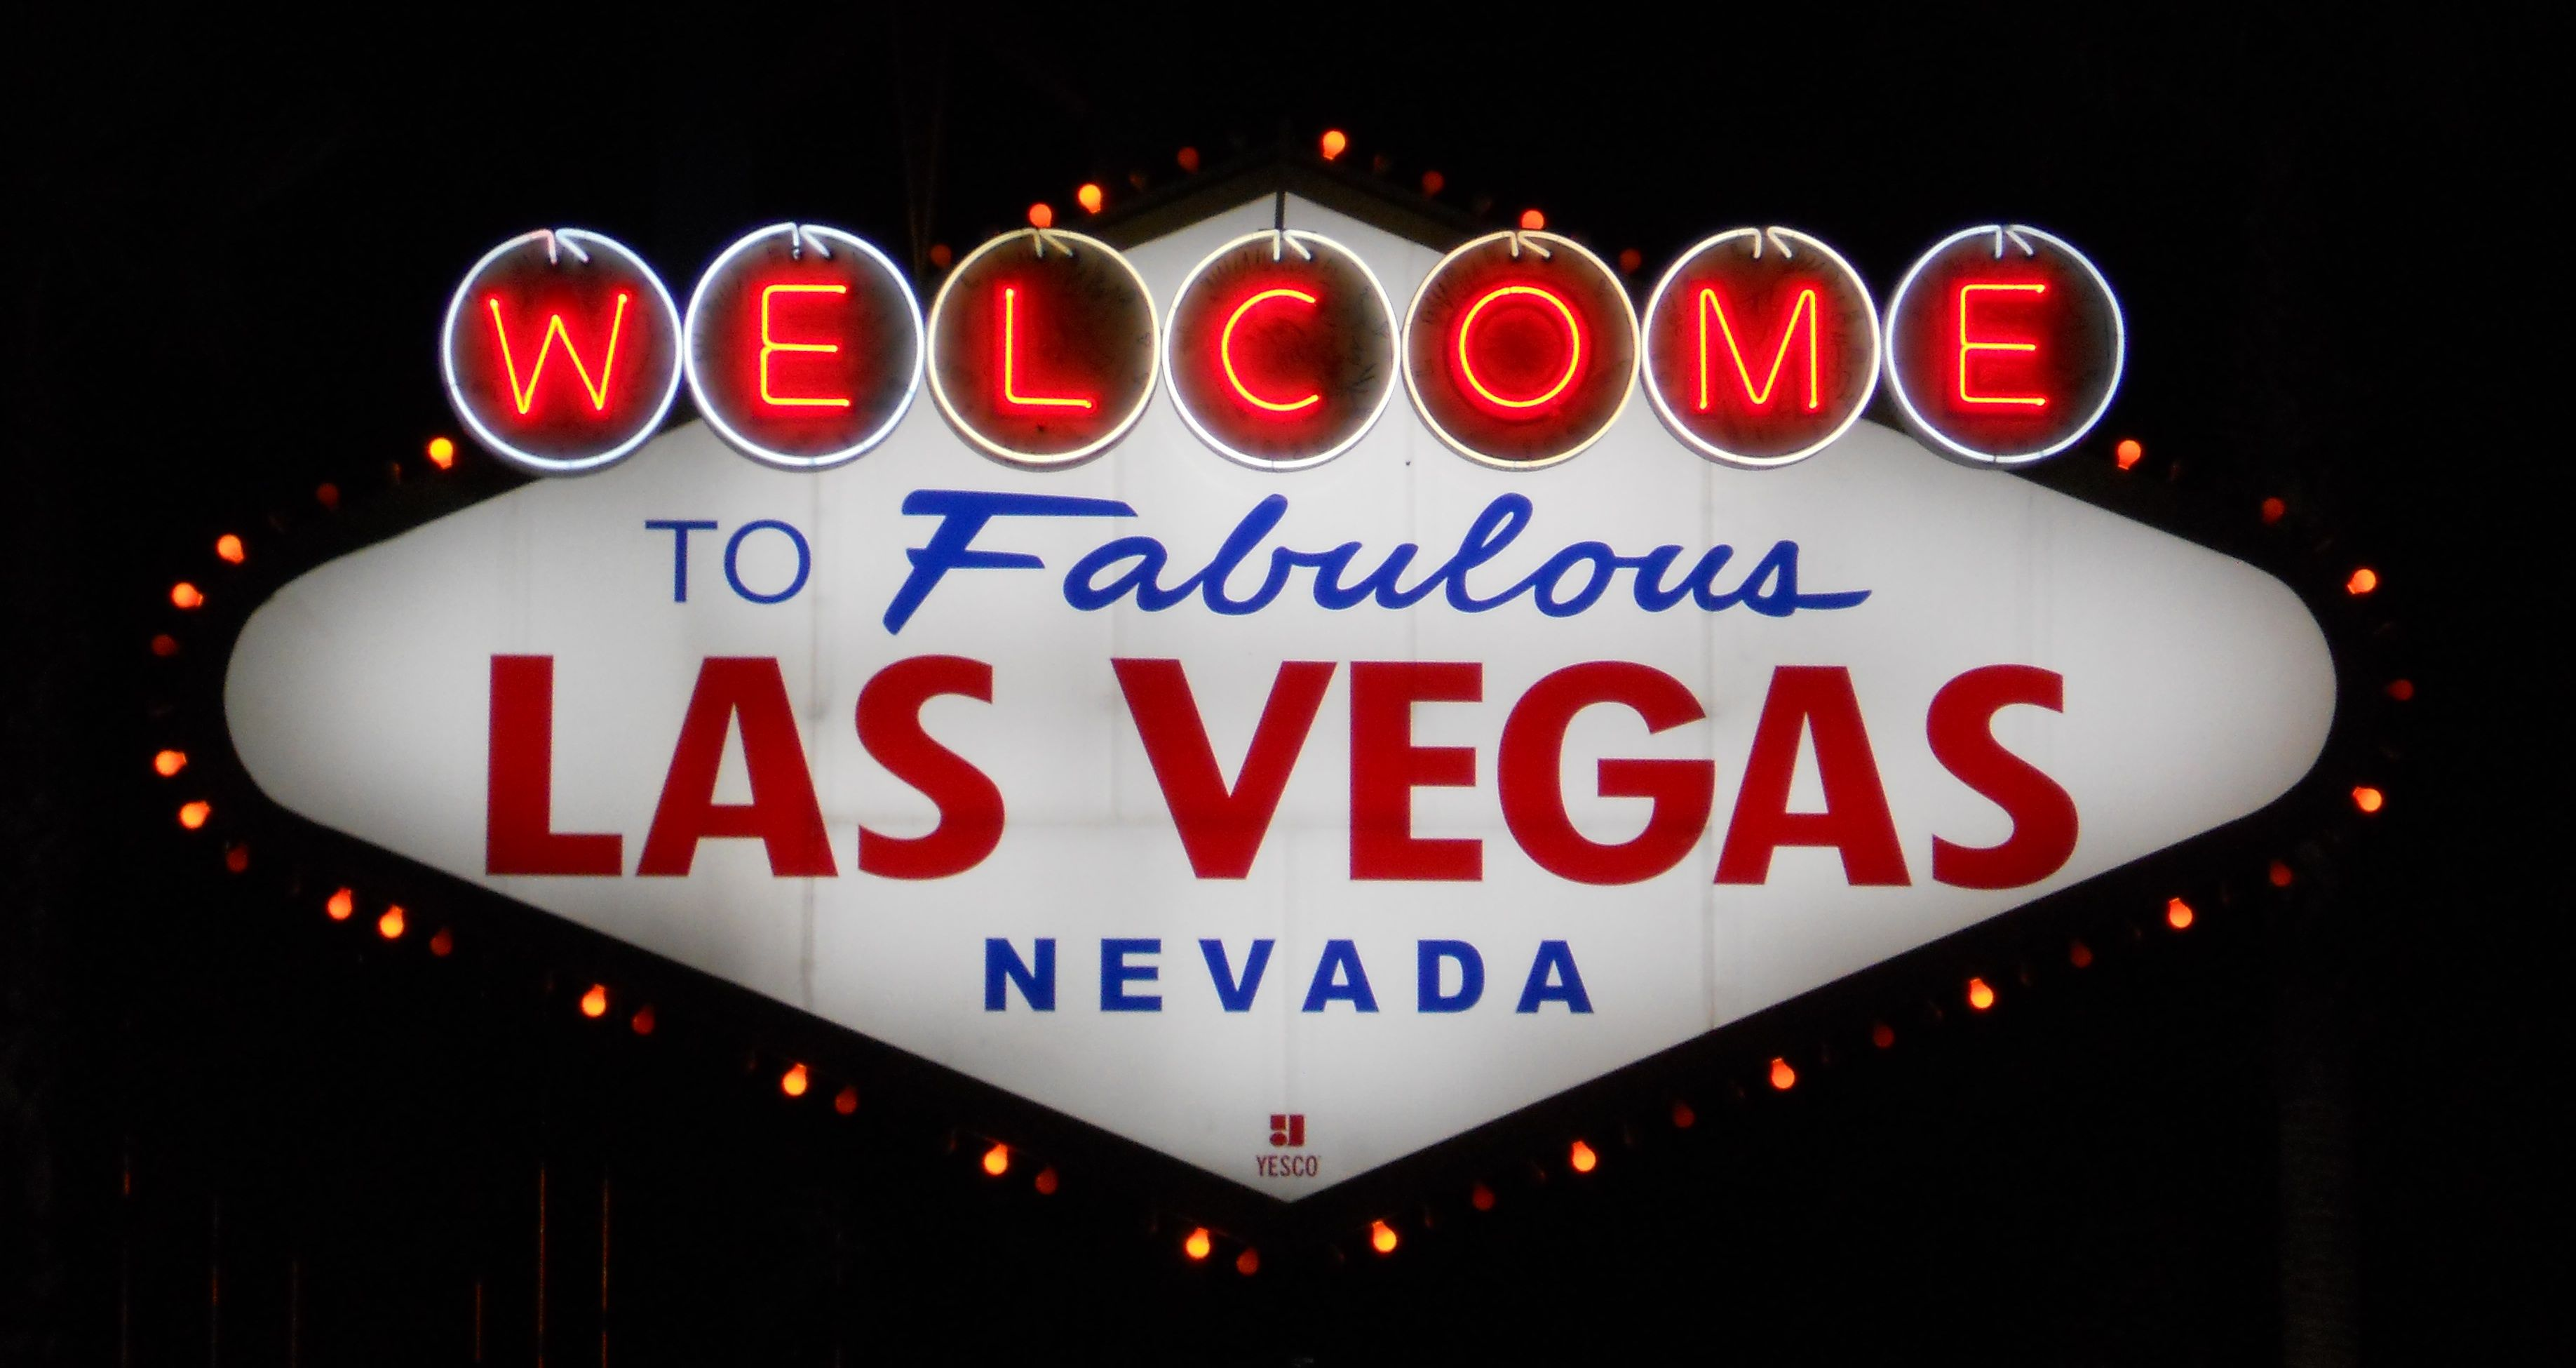 Las Vegas ~ Nevada